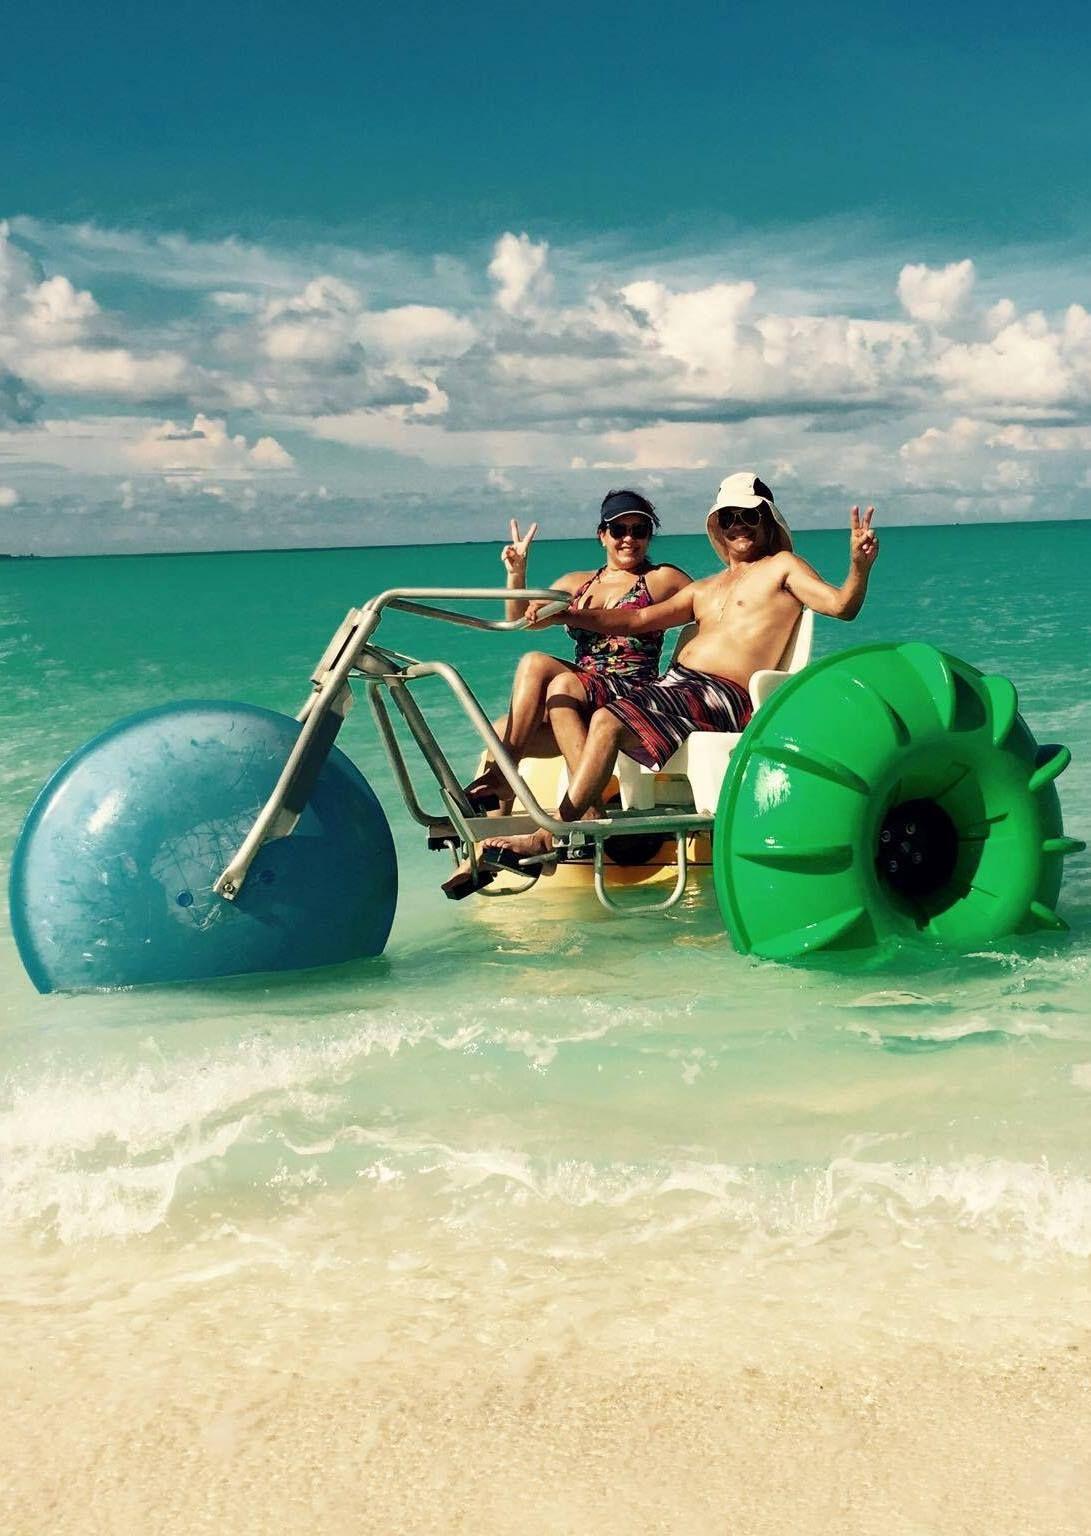 Resort Activities Diving Snorkeling Fishing Beach Honeymoon